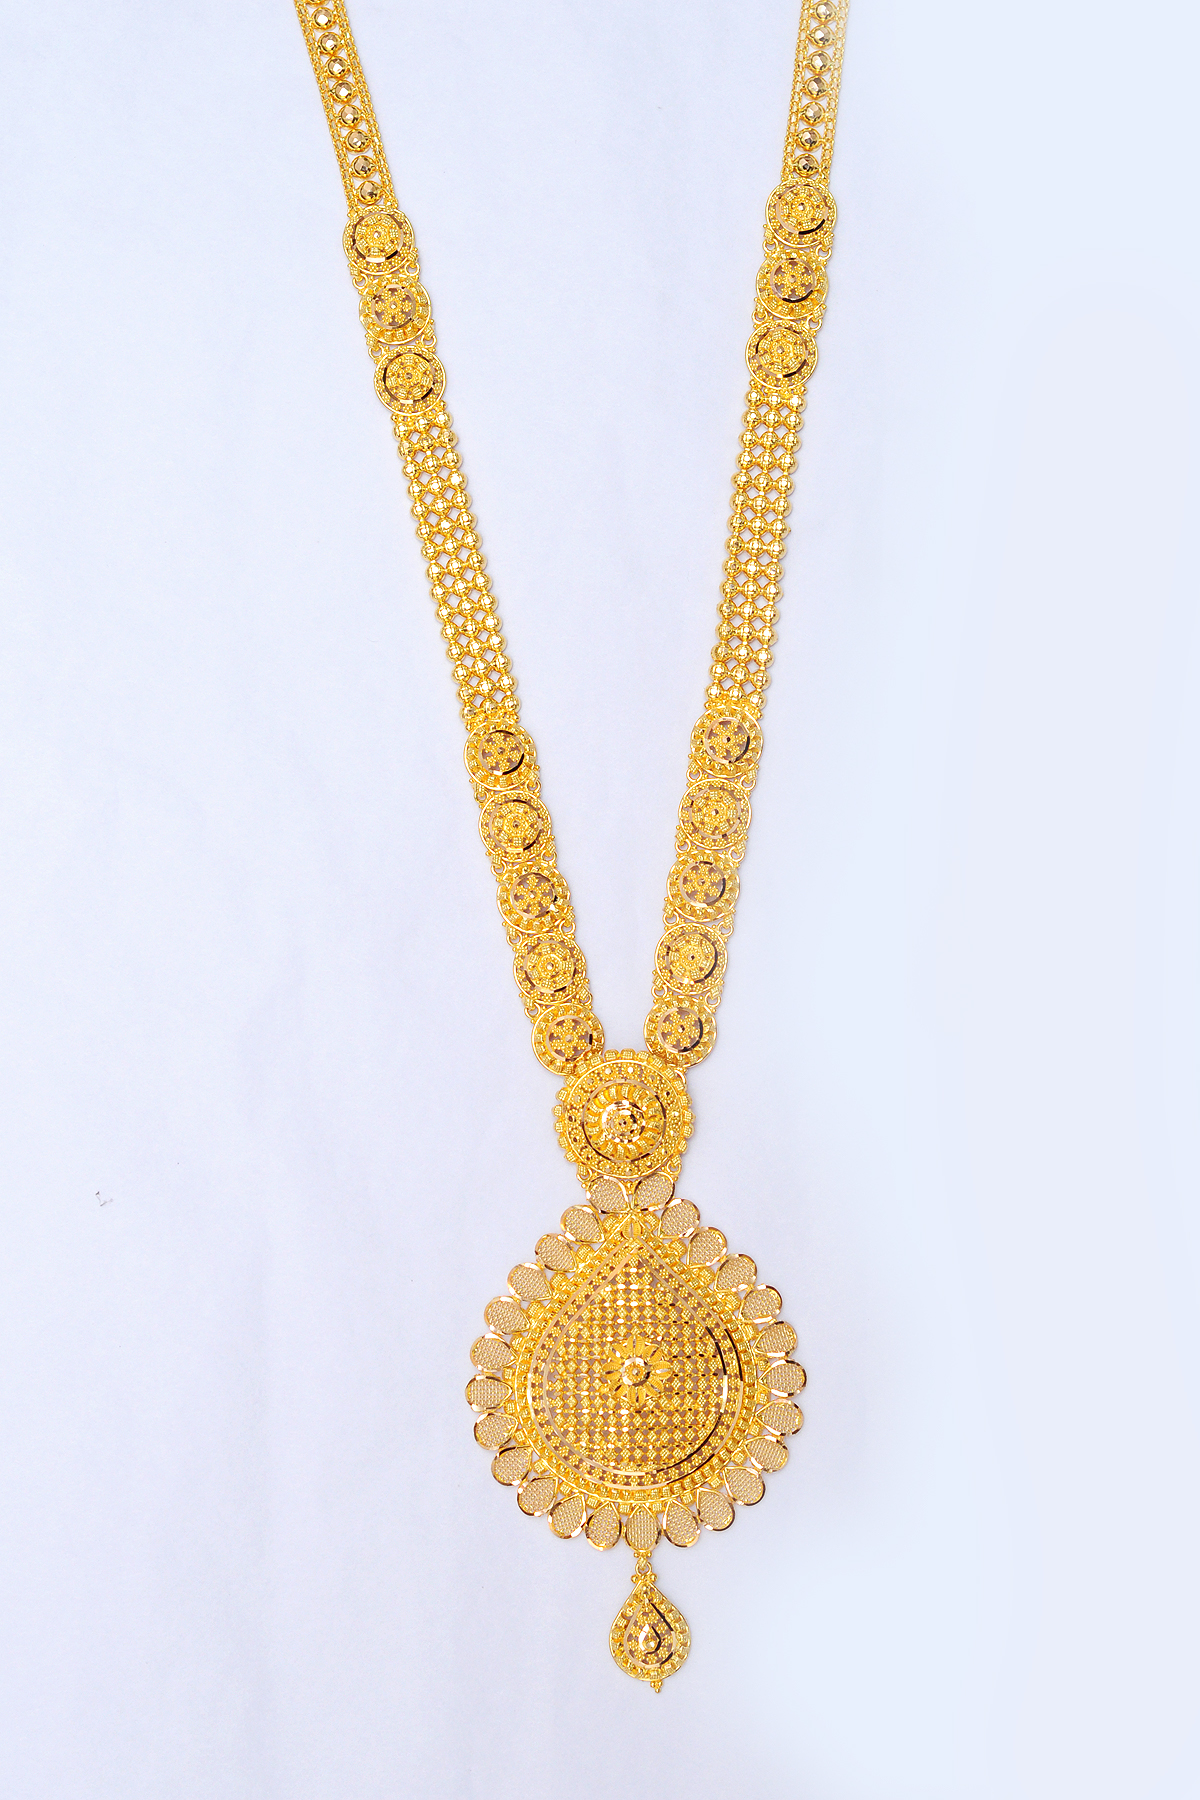 Latest Gold Long Necklace Designs | Gold Haram designs Uset Ranihaar mala set| wedding Necklace